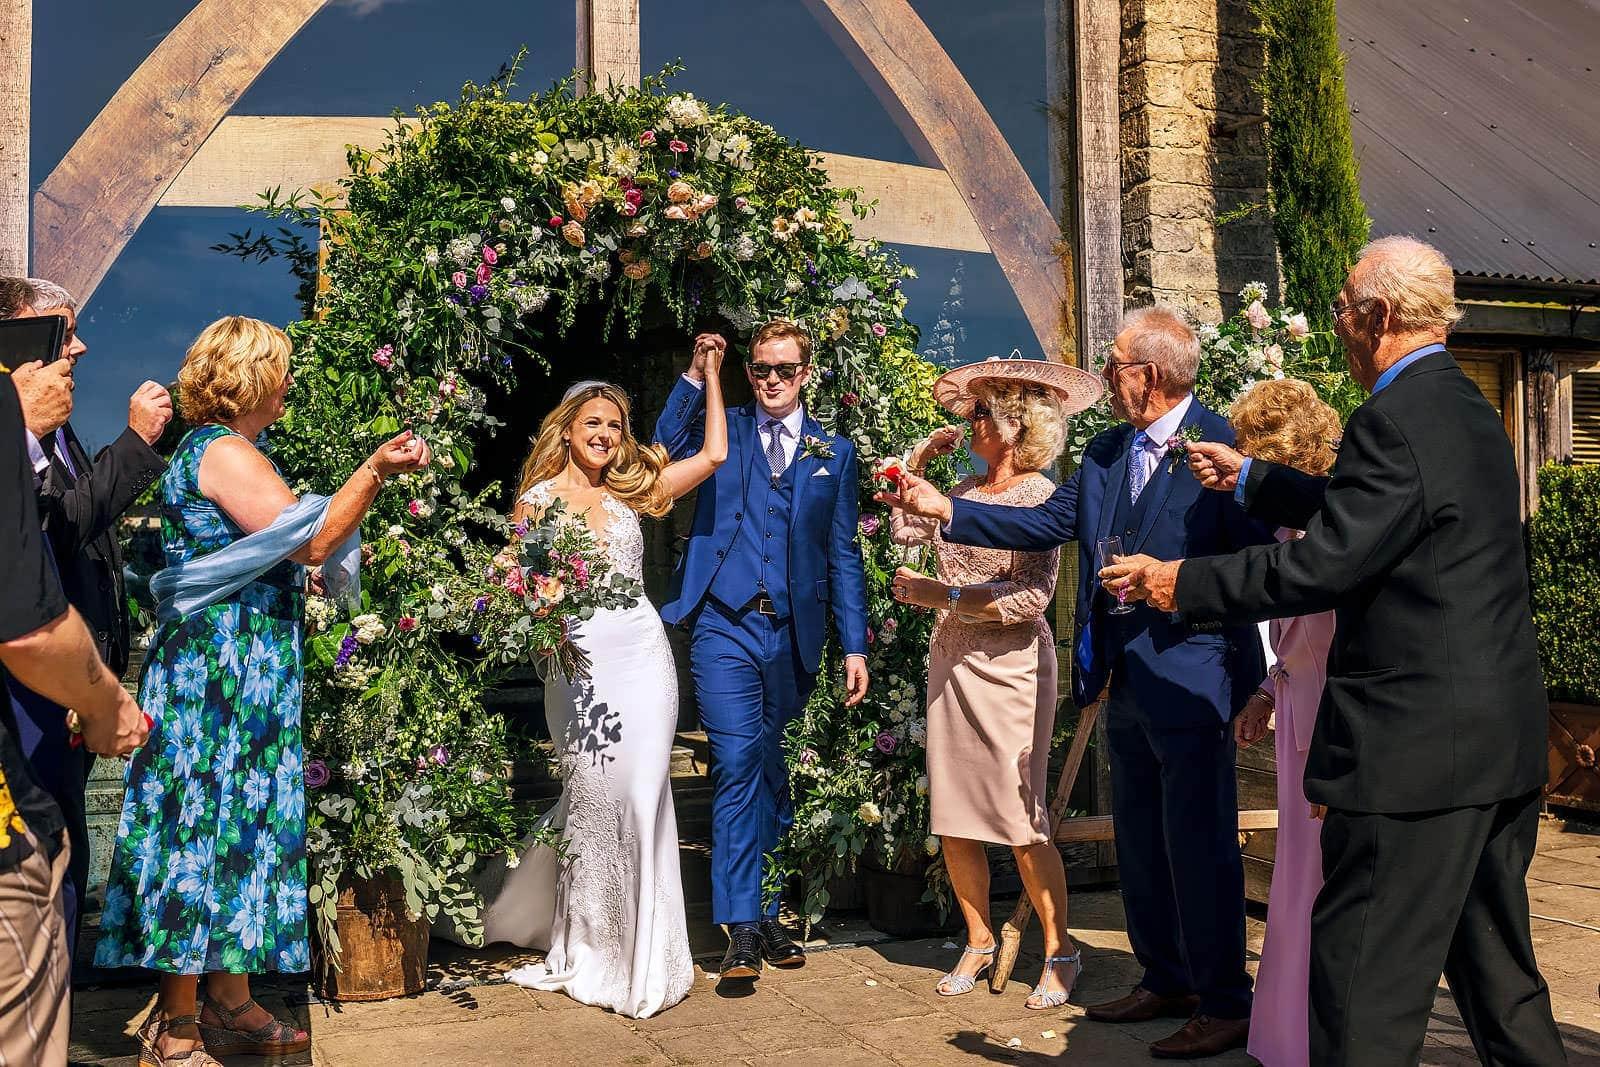 Cripps Barn wedding photographer Dan Morris